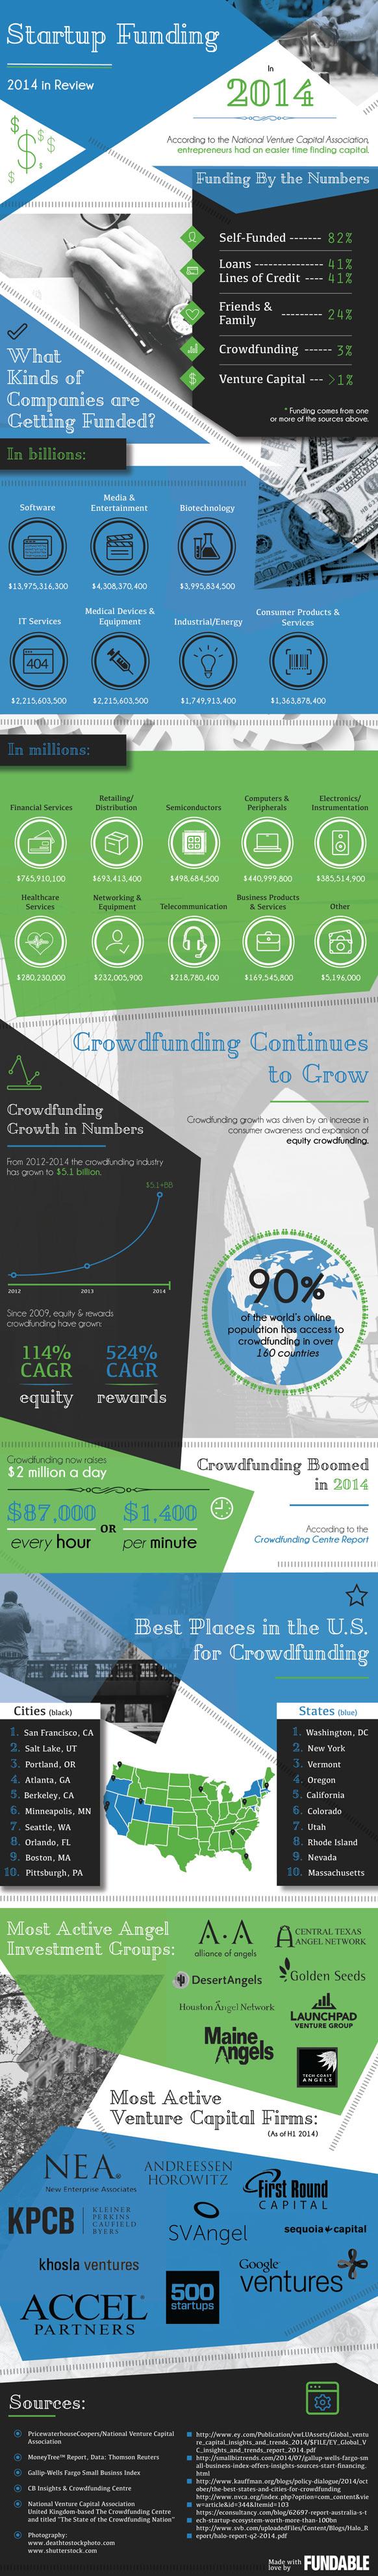 fondos-2014-startups